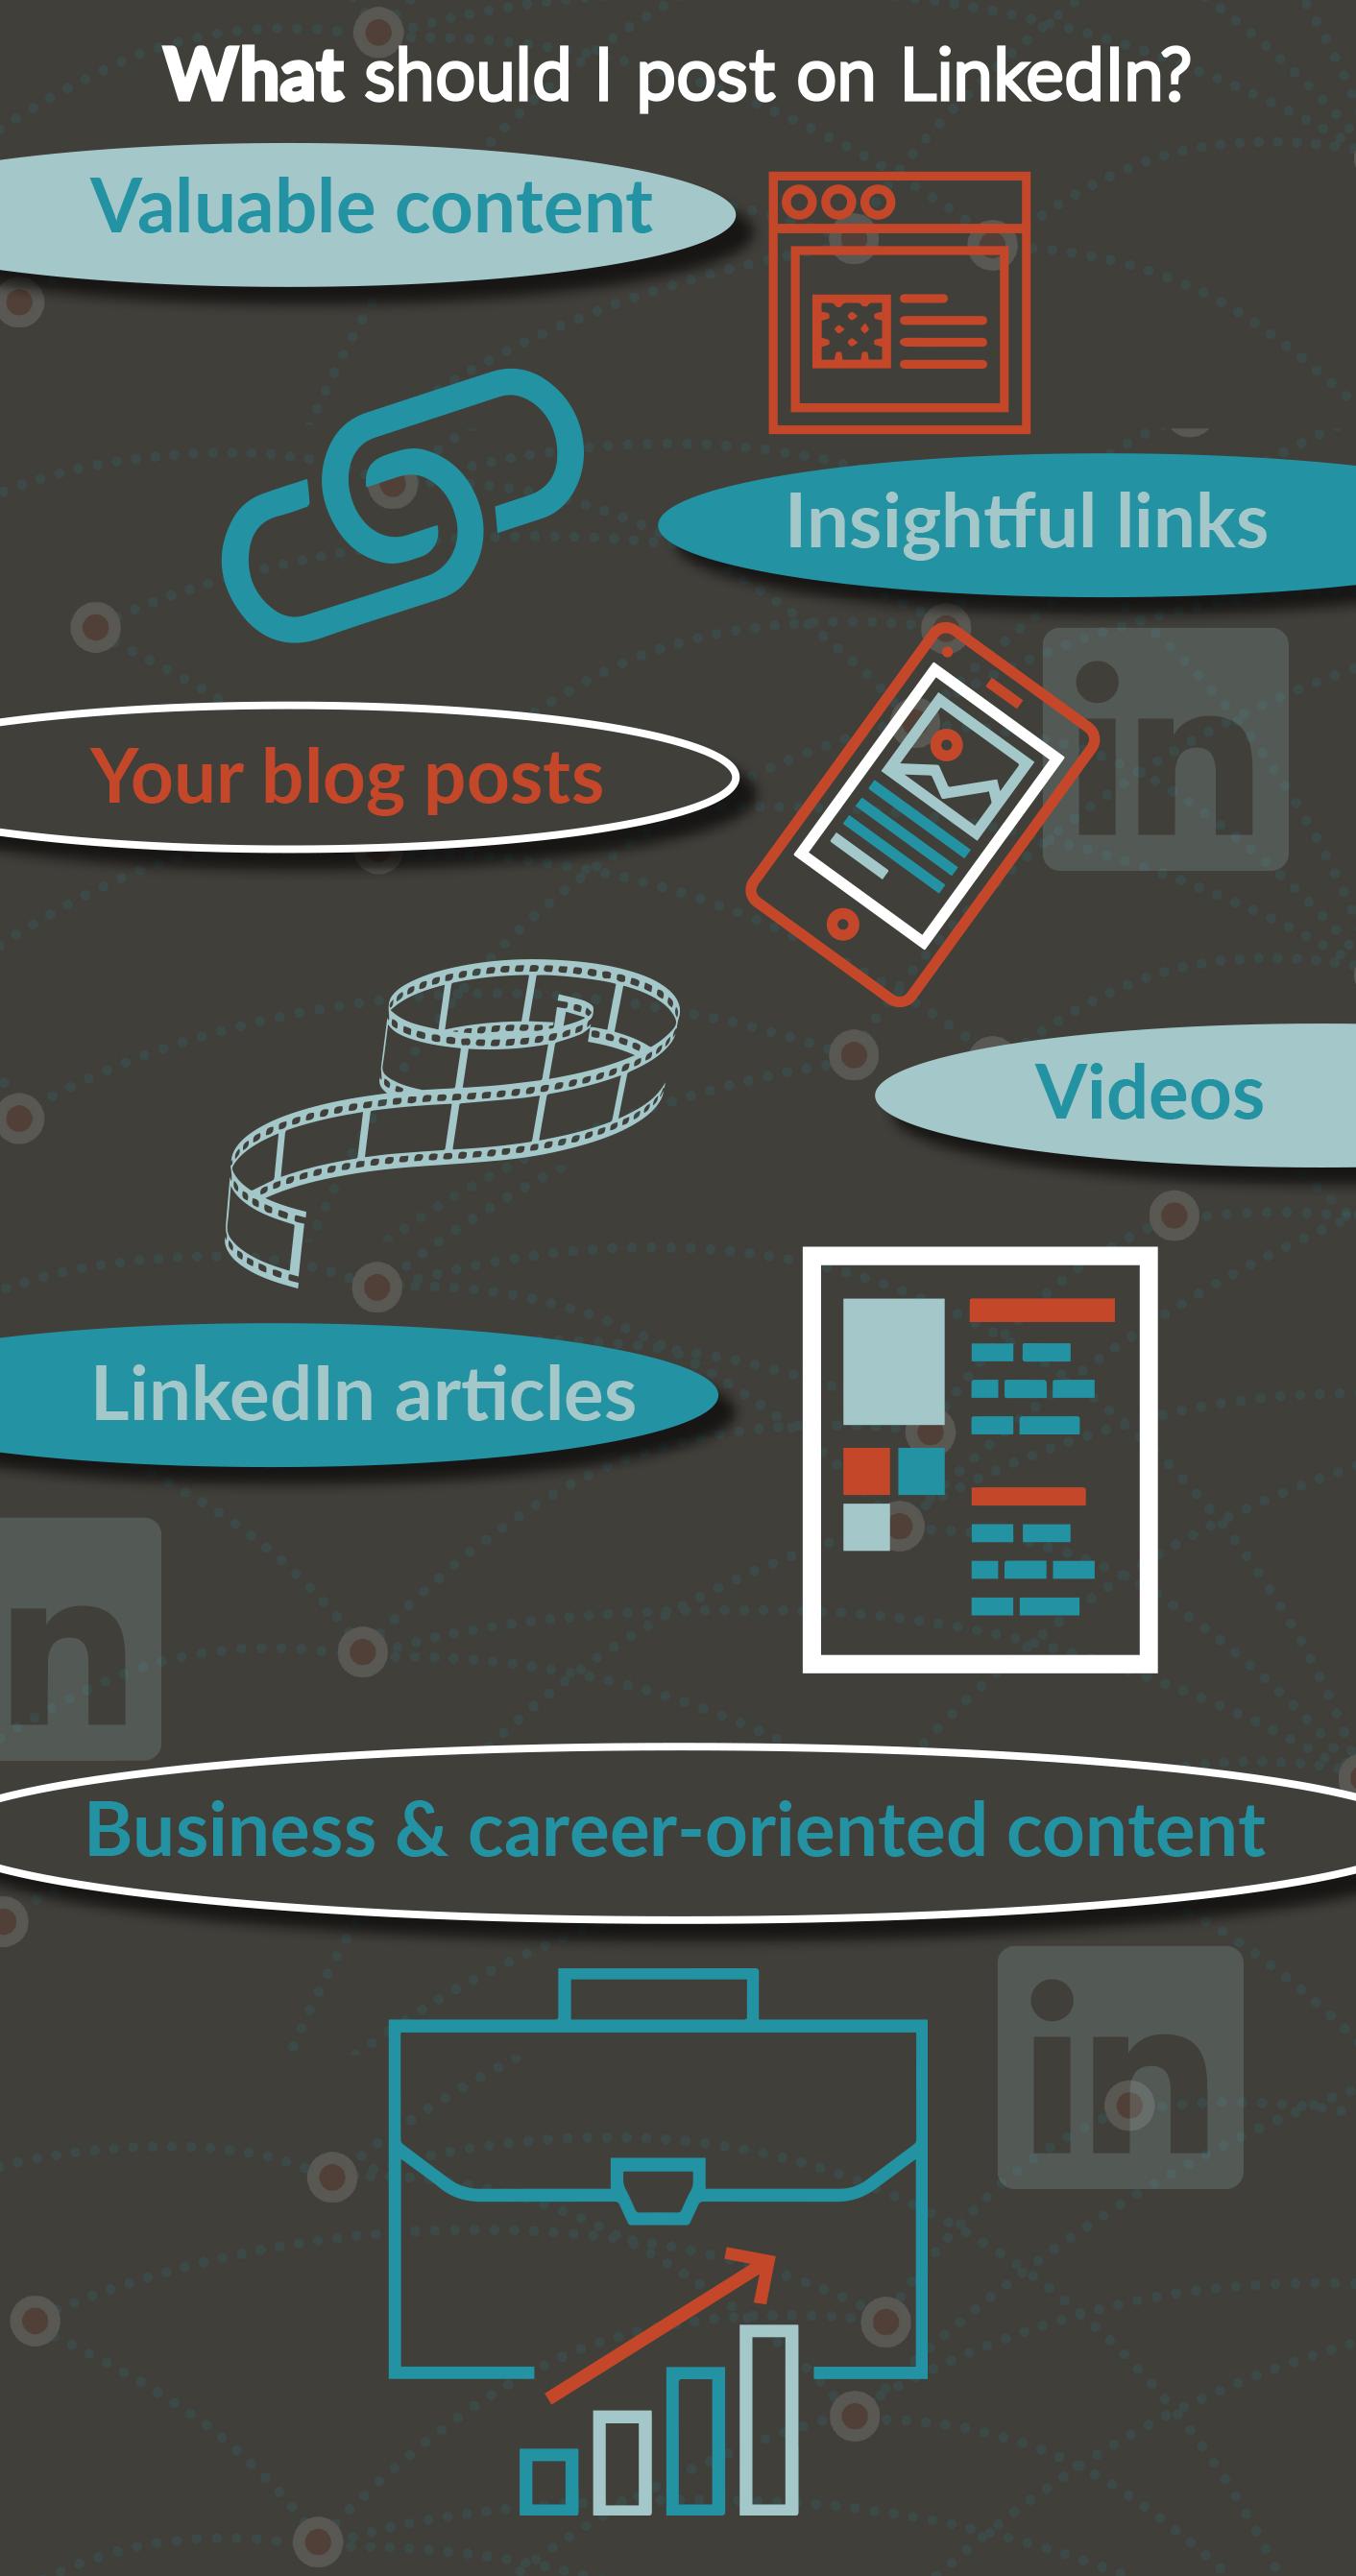 Jones-complete-social-media-guide-linkedin-whattopost-1